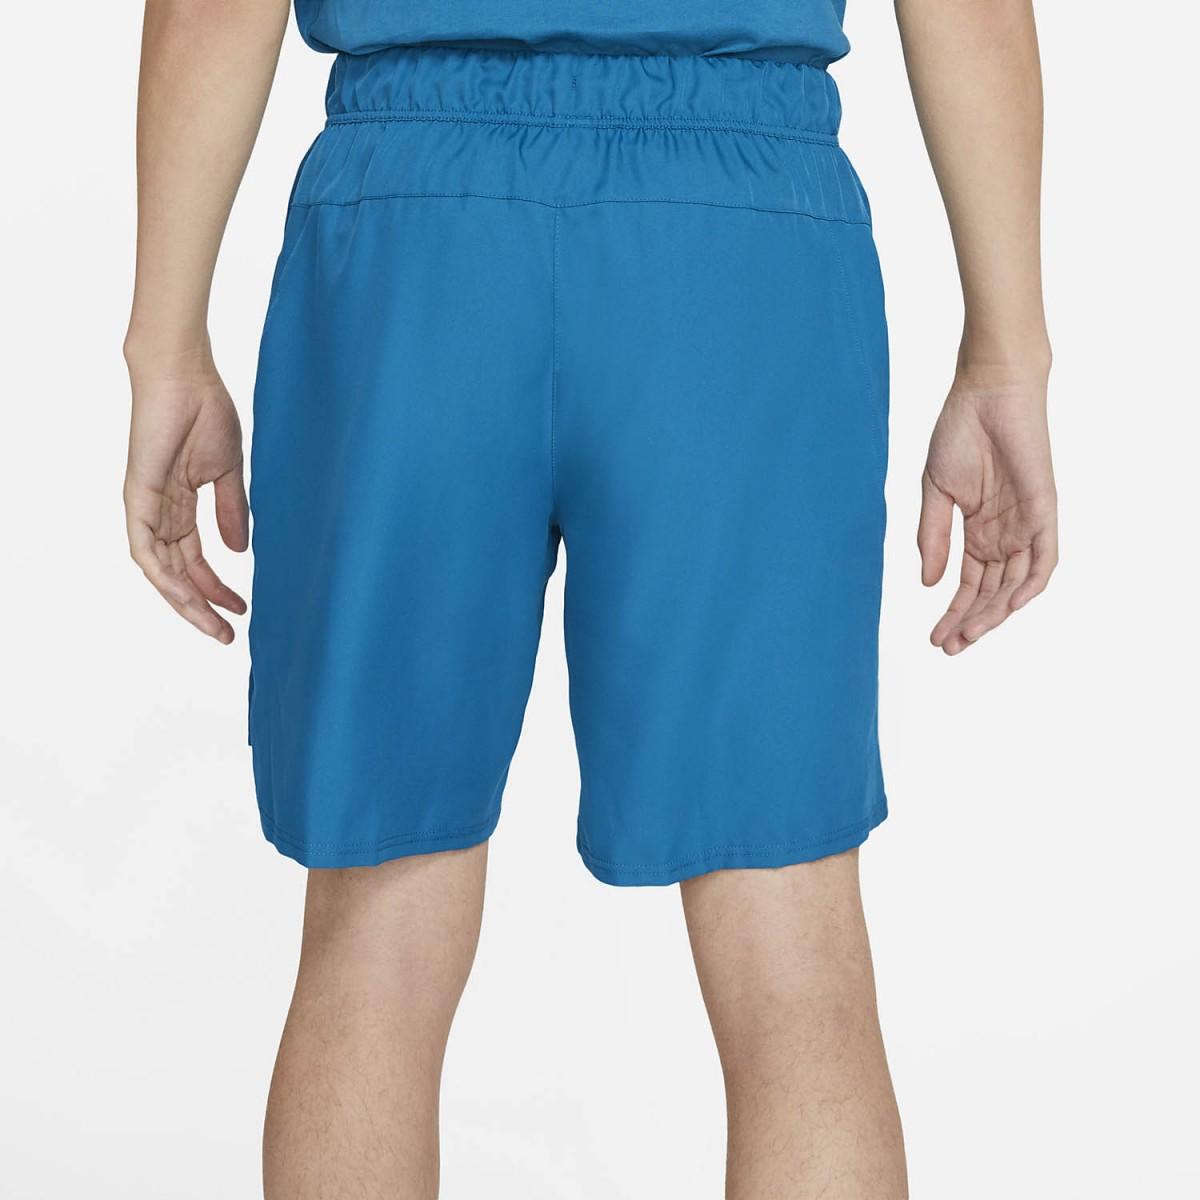 Теннисные шорты мужские Nike Court Flex Victory 9IN Short green abyss/white